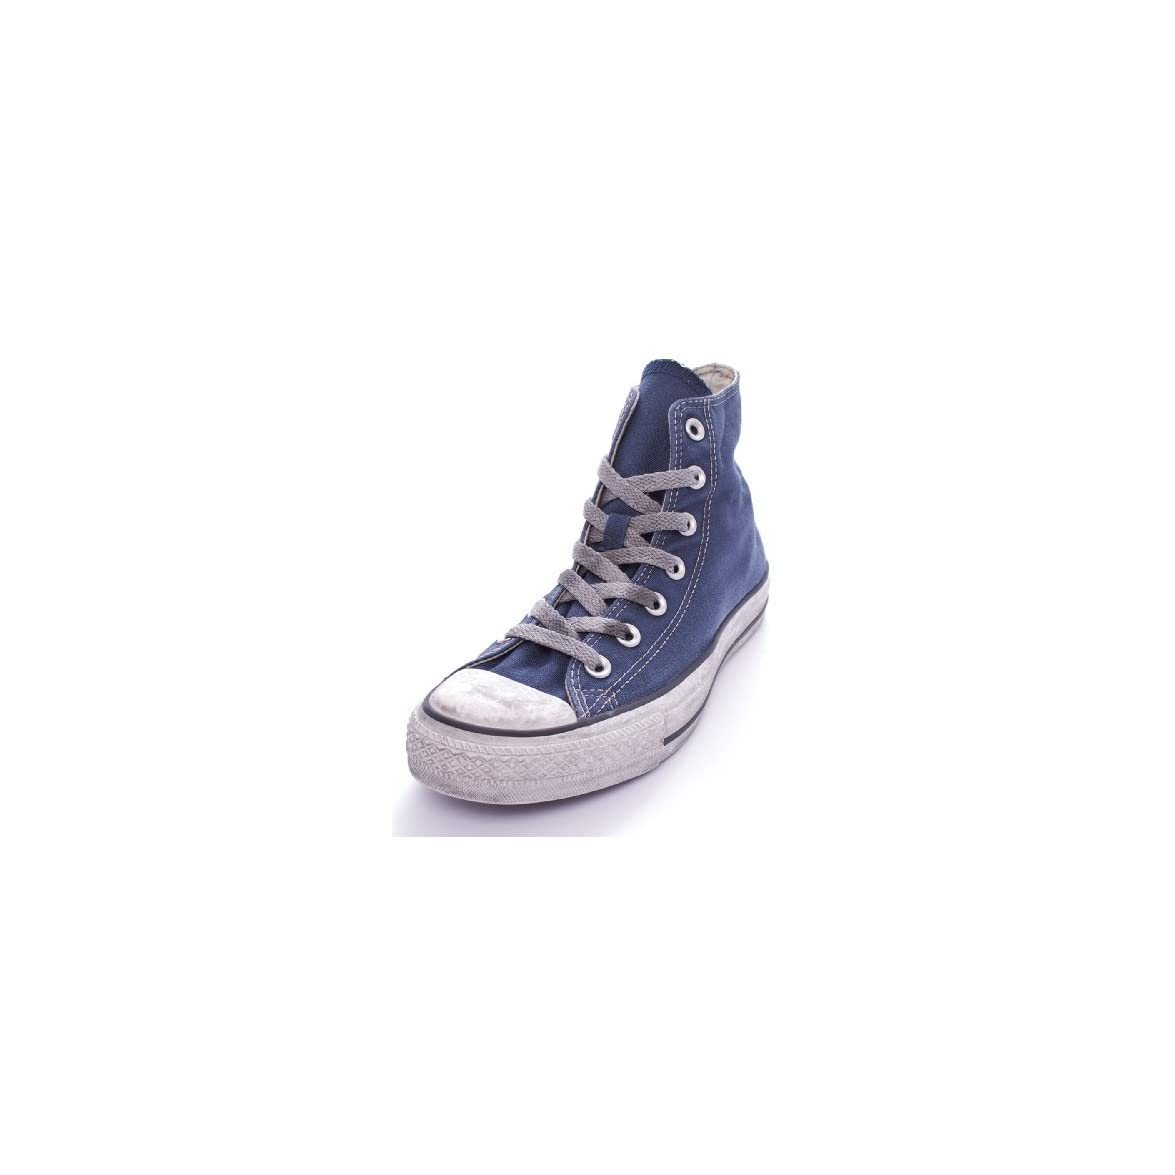 Converse Ct Hi 141061c Unisex - Adulto Scarpe Sportive